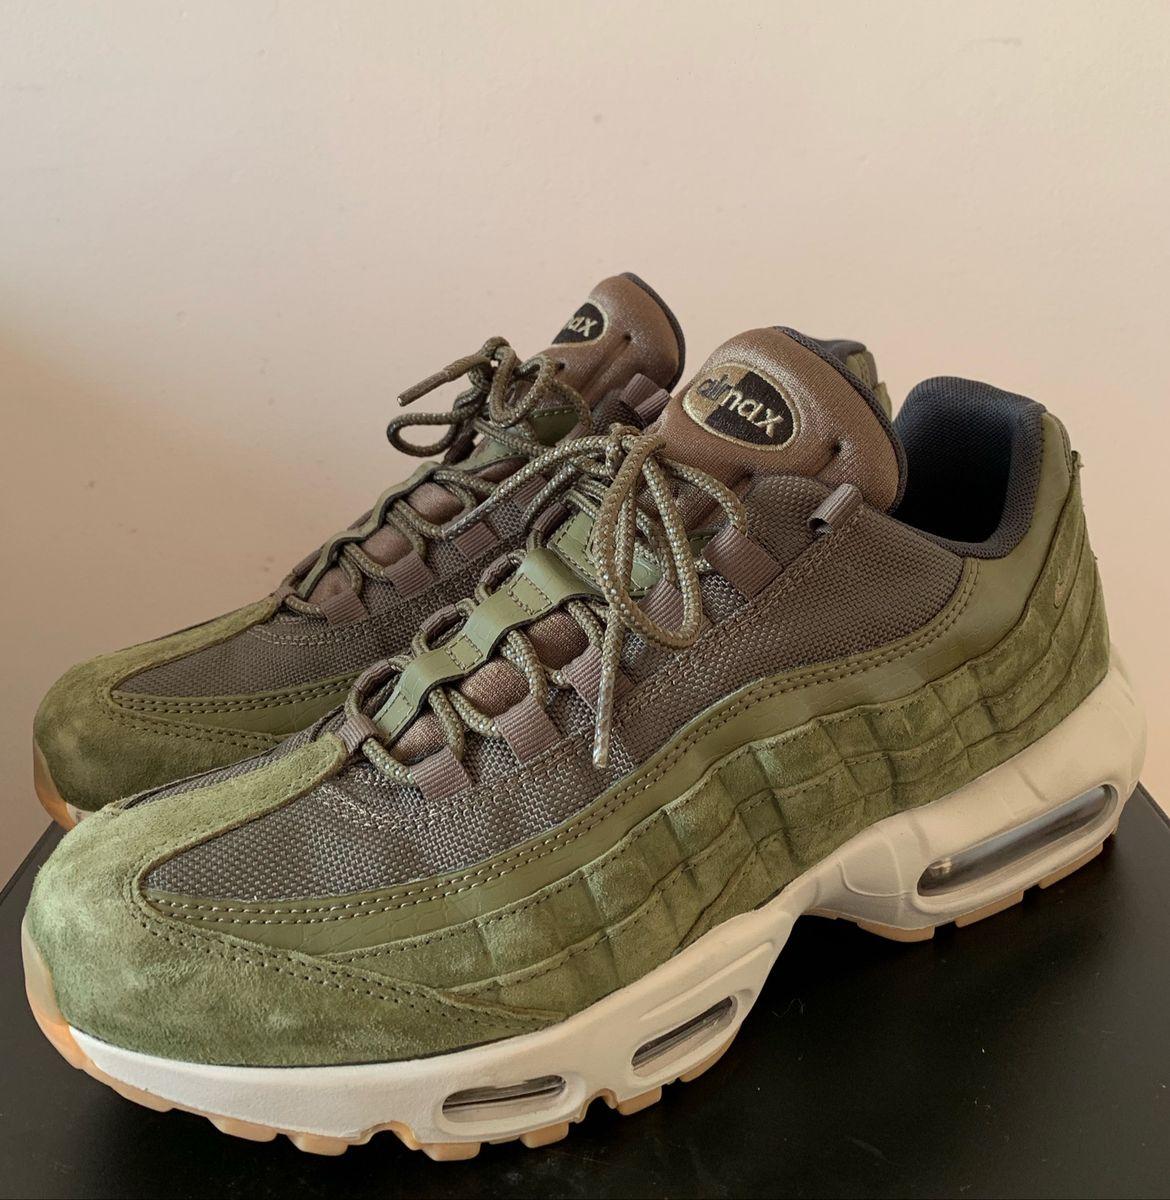 Nike Air Max 95 | Tênis Masculino Nike Usado 35461615 | enjoei